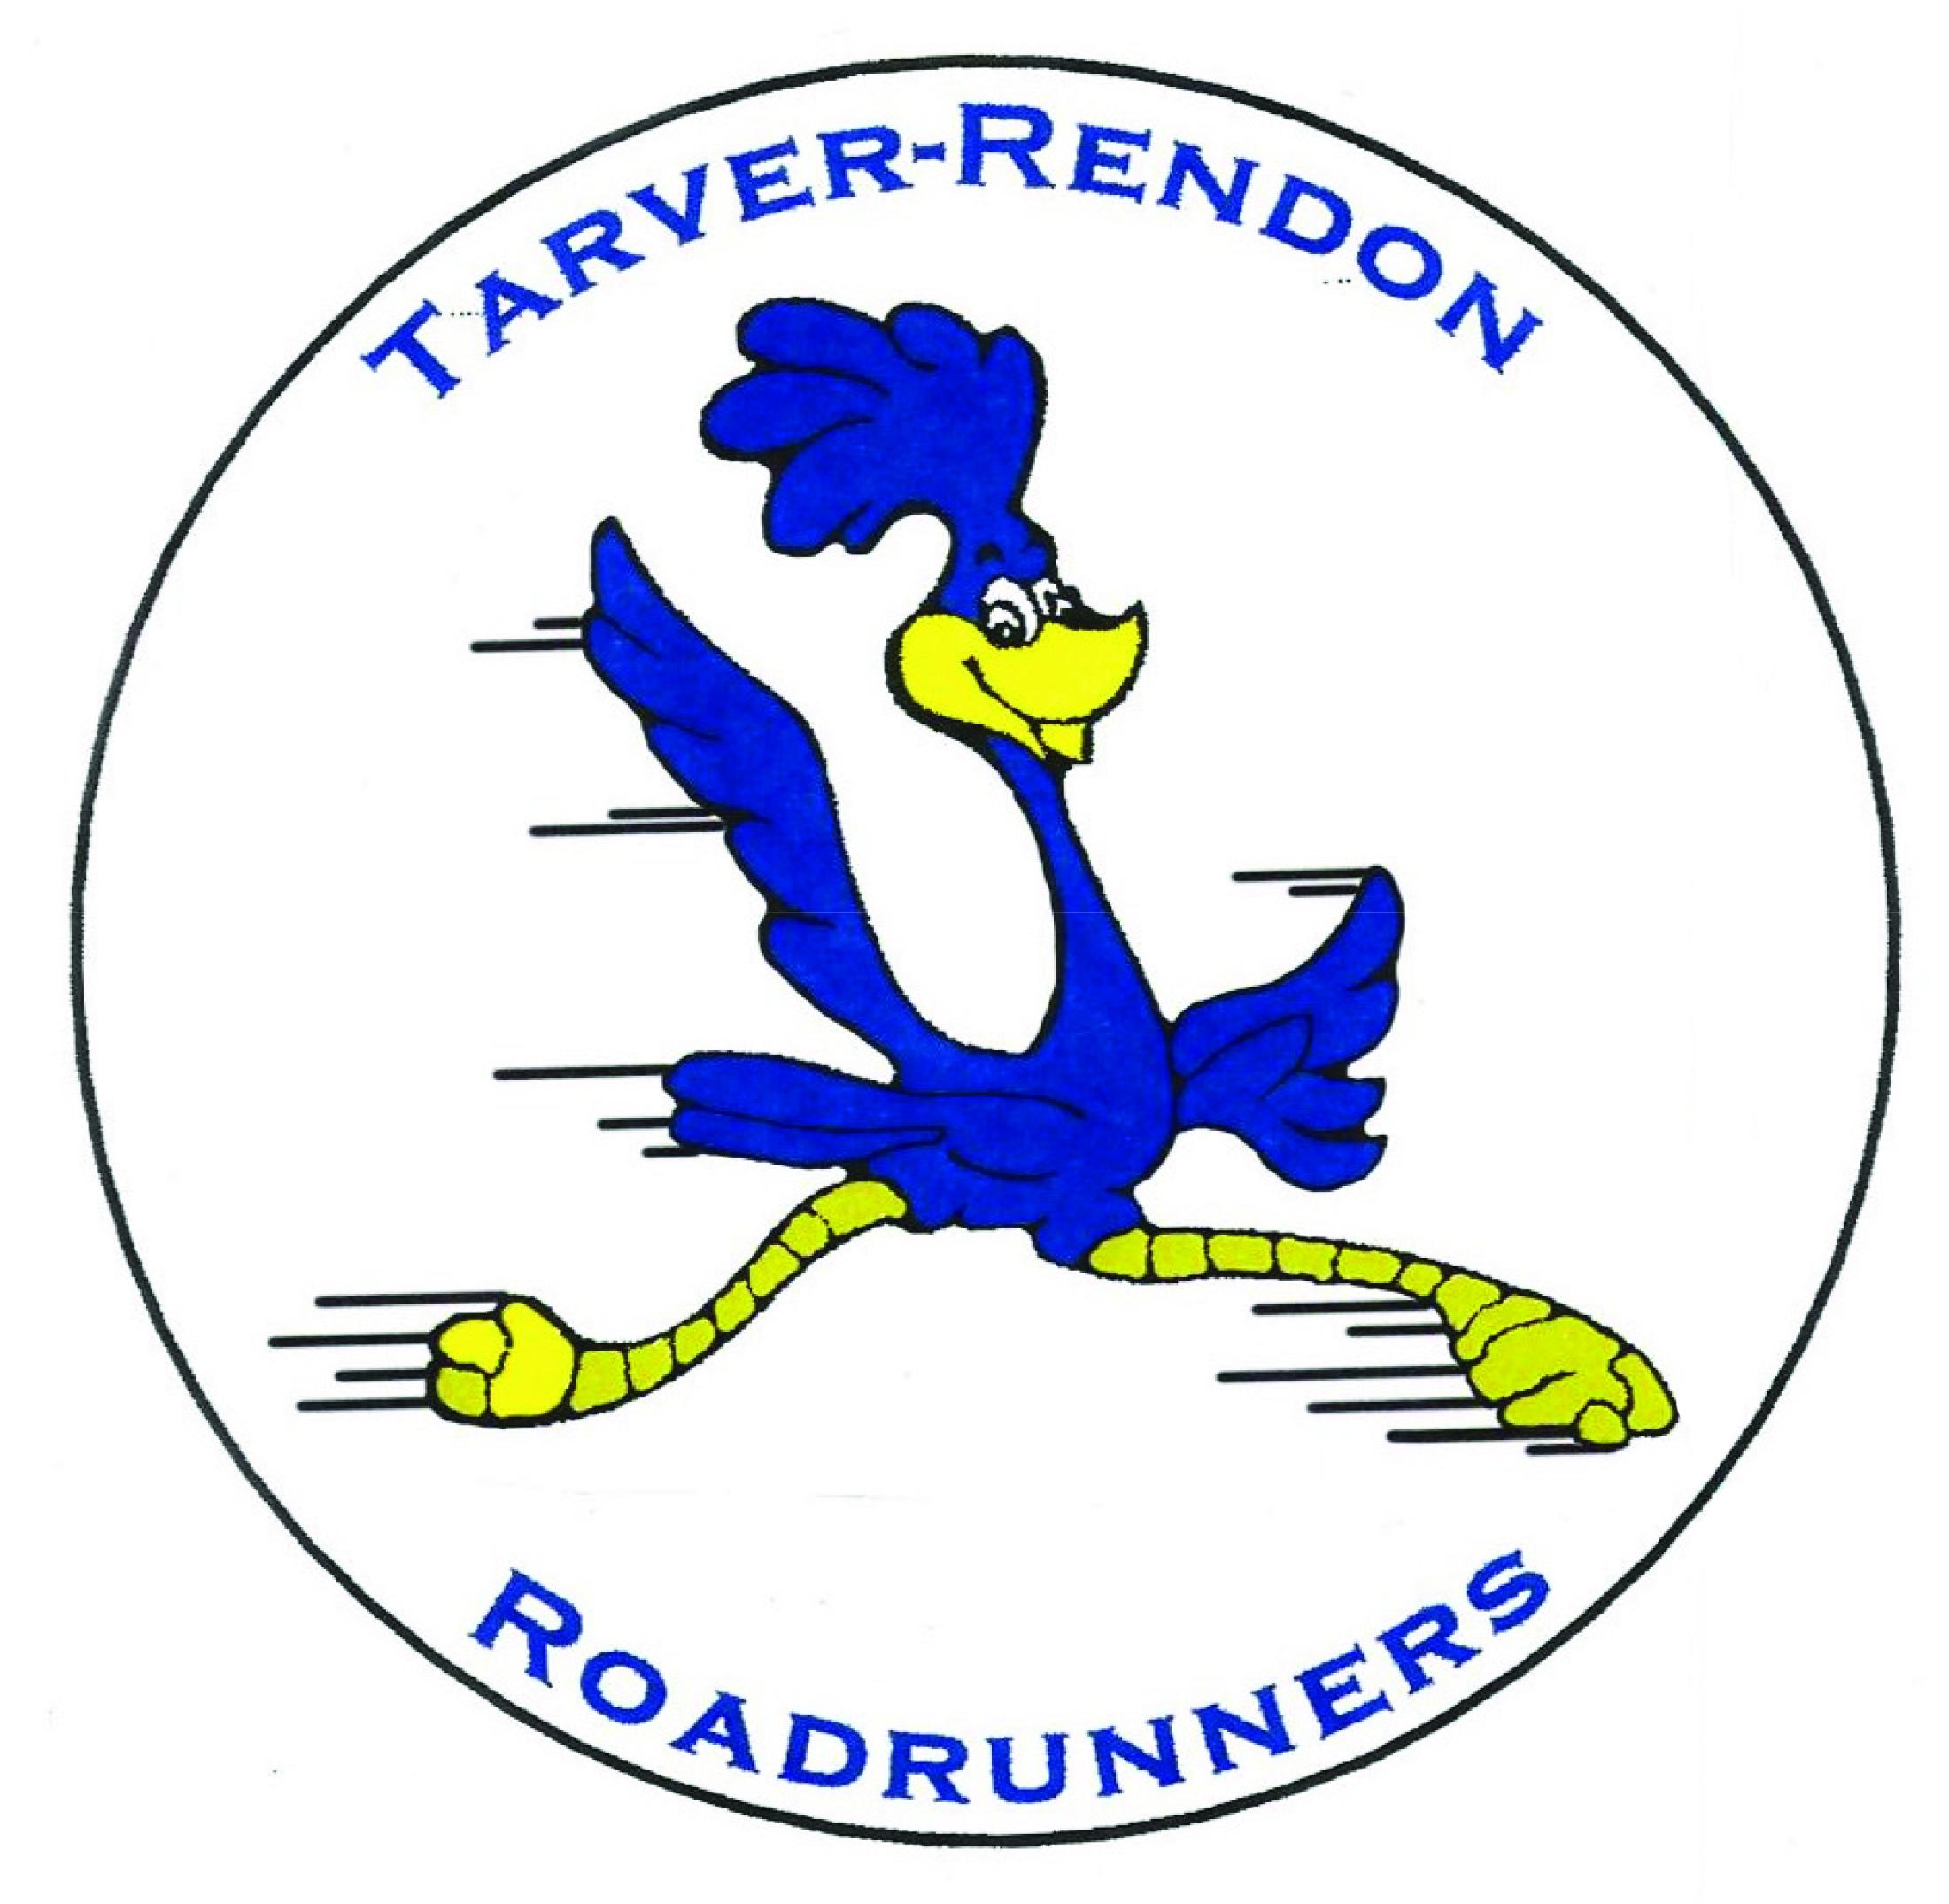 PTA - Tarver-Rendon Elementary